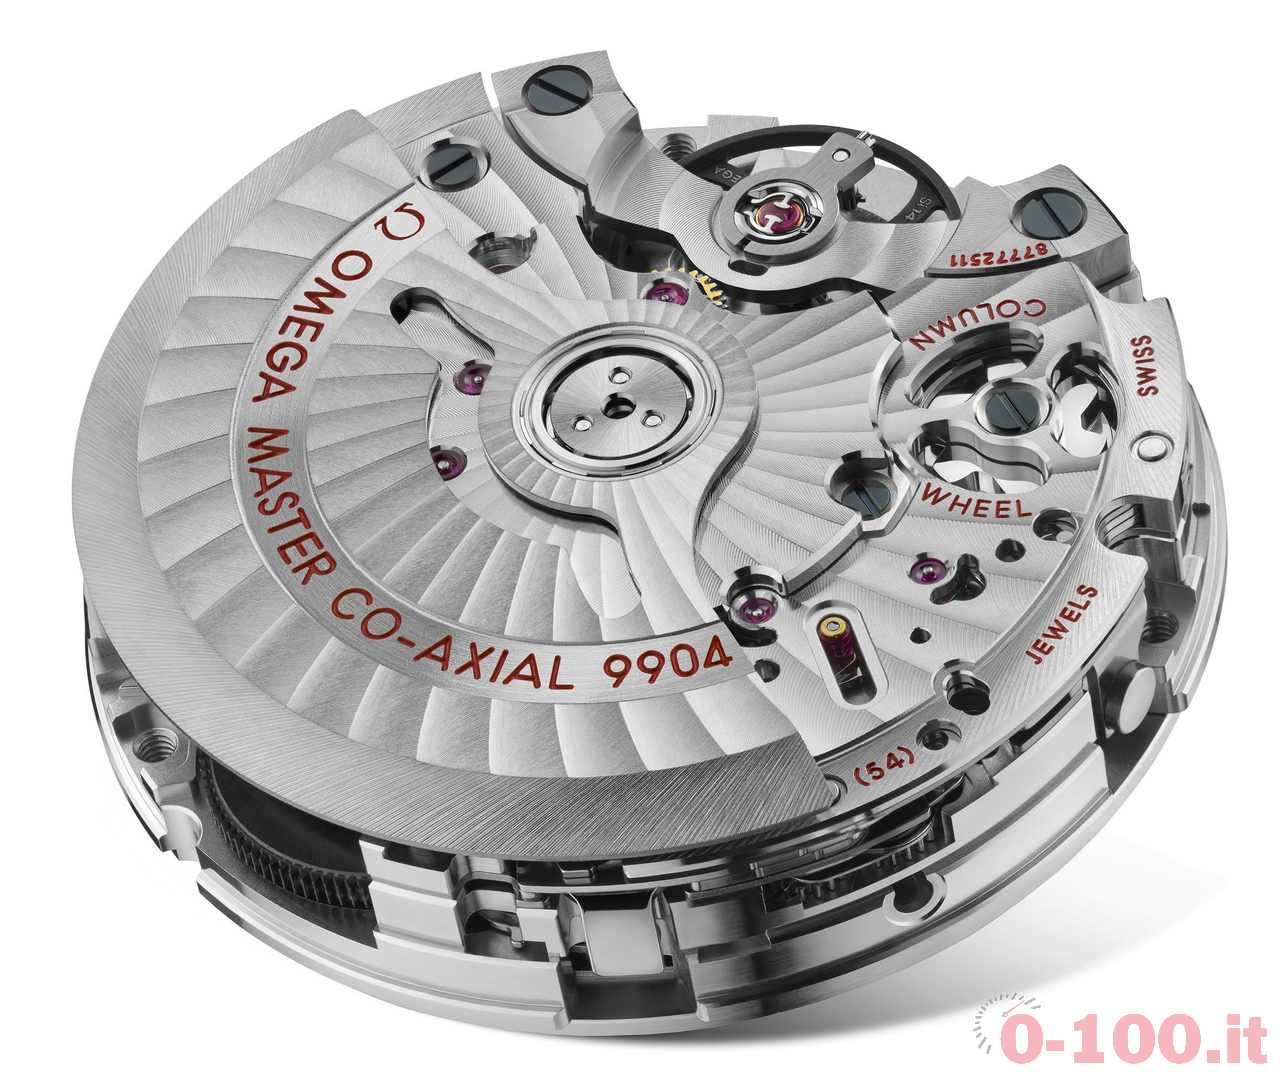 baselworld-2016-omega-speedmaster-moonphase-master-chronometer-ref-304-33-44-52-03-001_0-1007